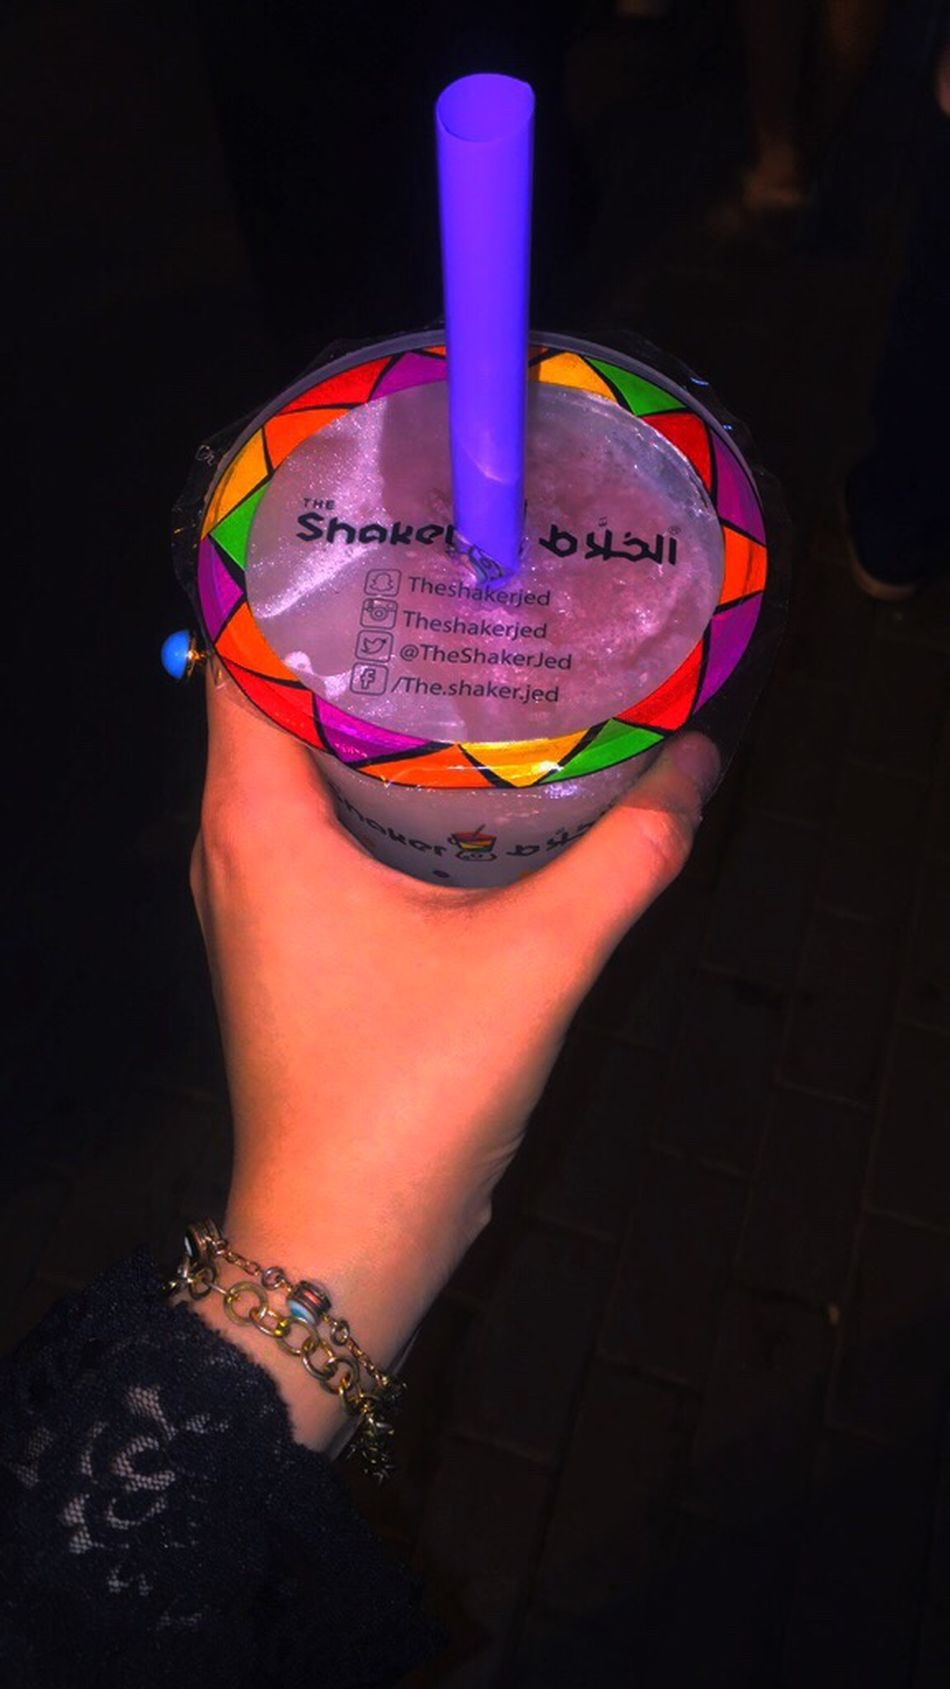 Juice Blackberry Shaker